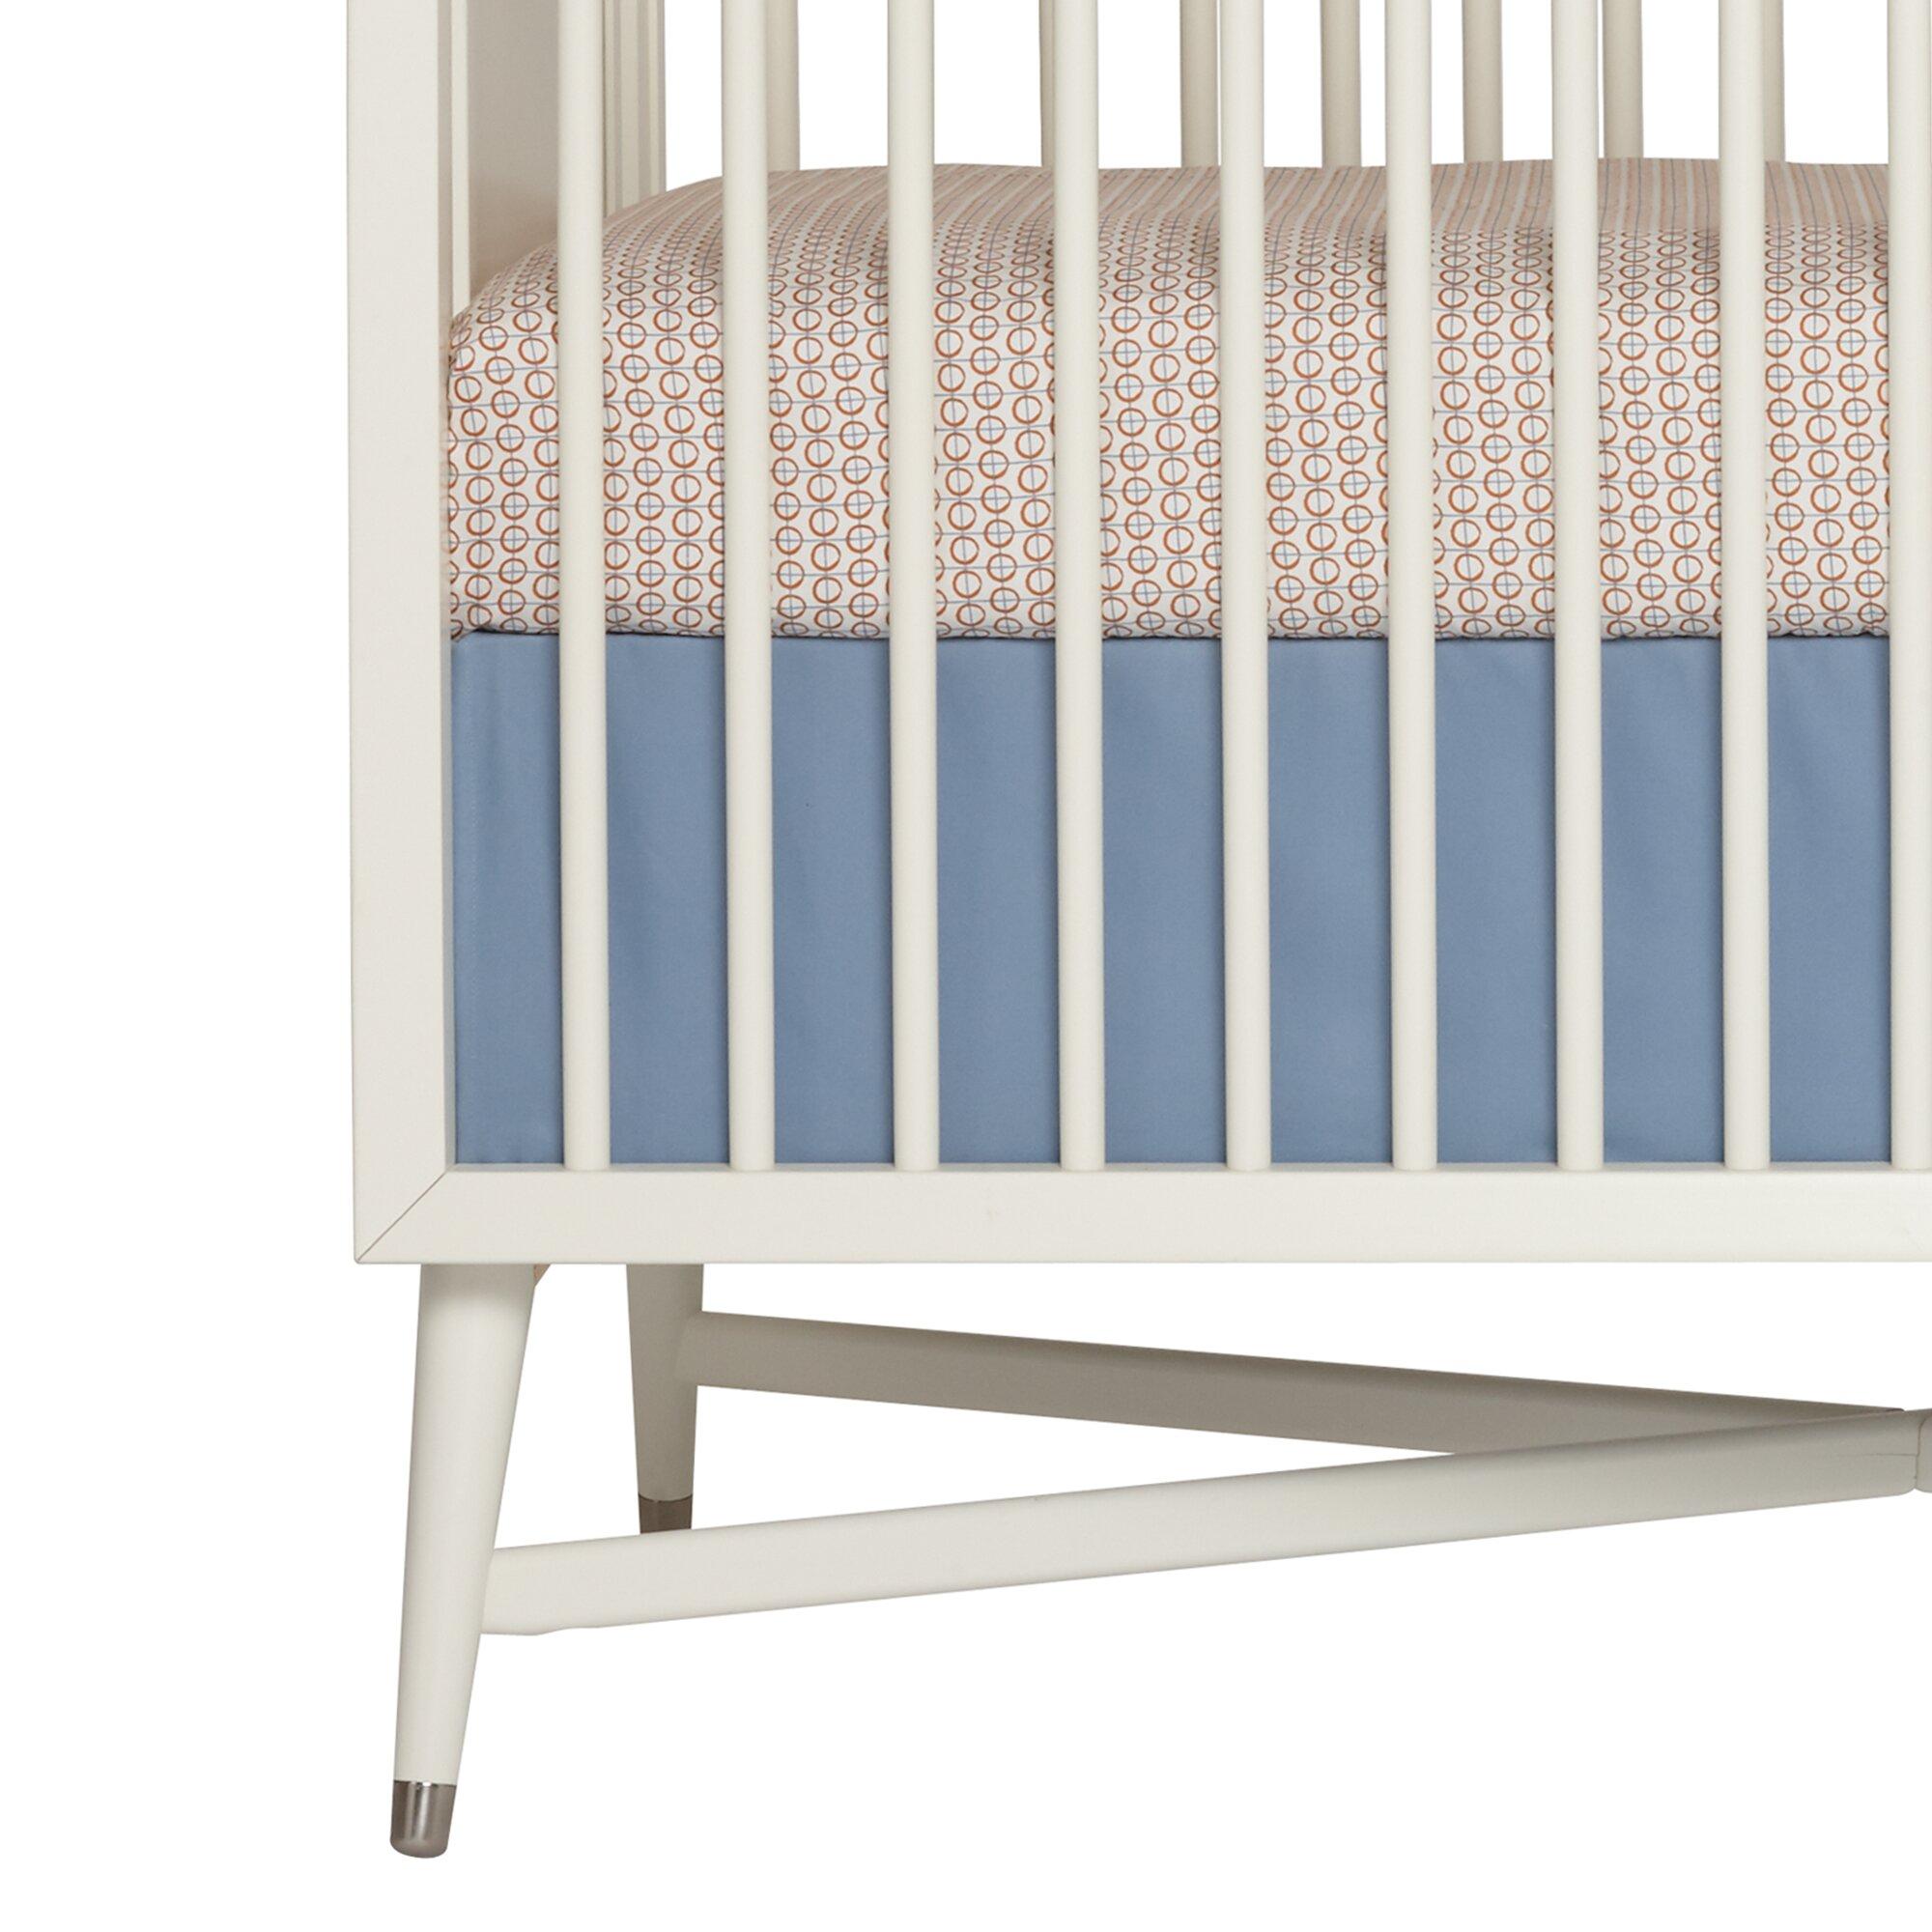 dwellstudio flight denim crib skirt reviews dwellstudio